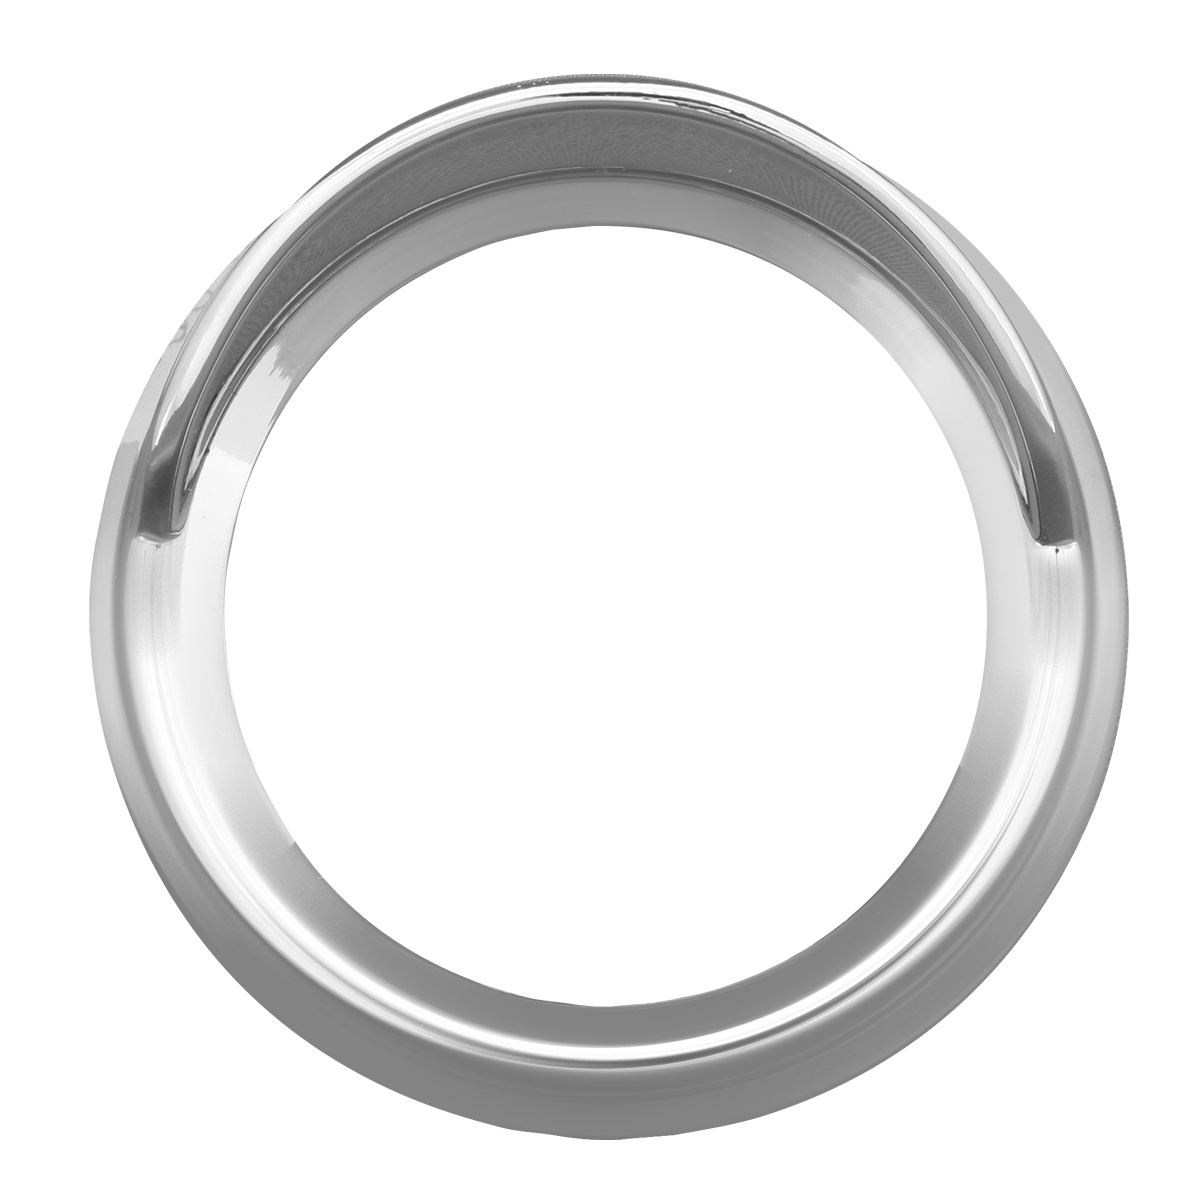 68392 Chrome Plastic Pyrometer Snap-On Gauge Cover w/ Visor for KW